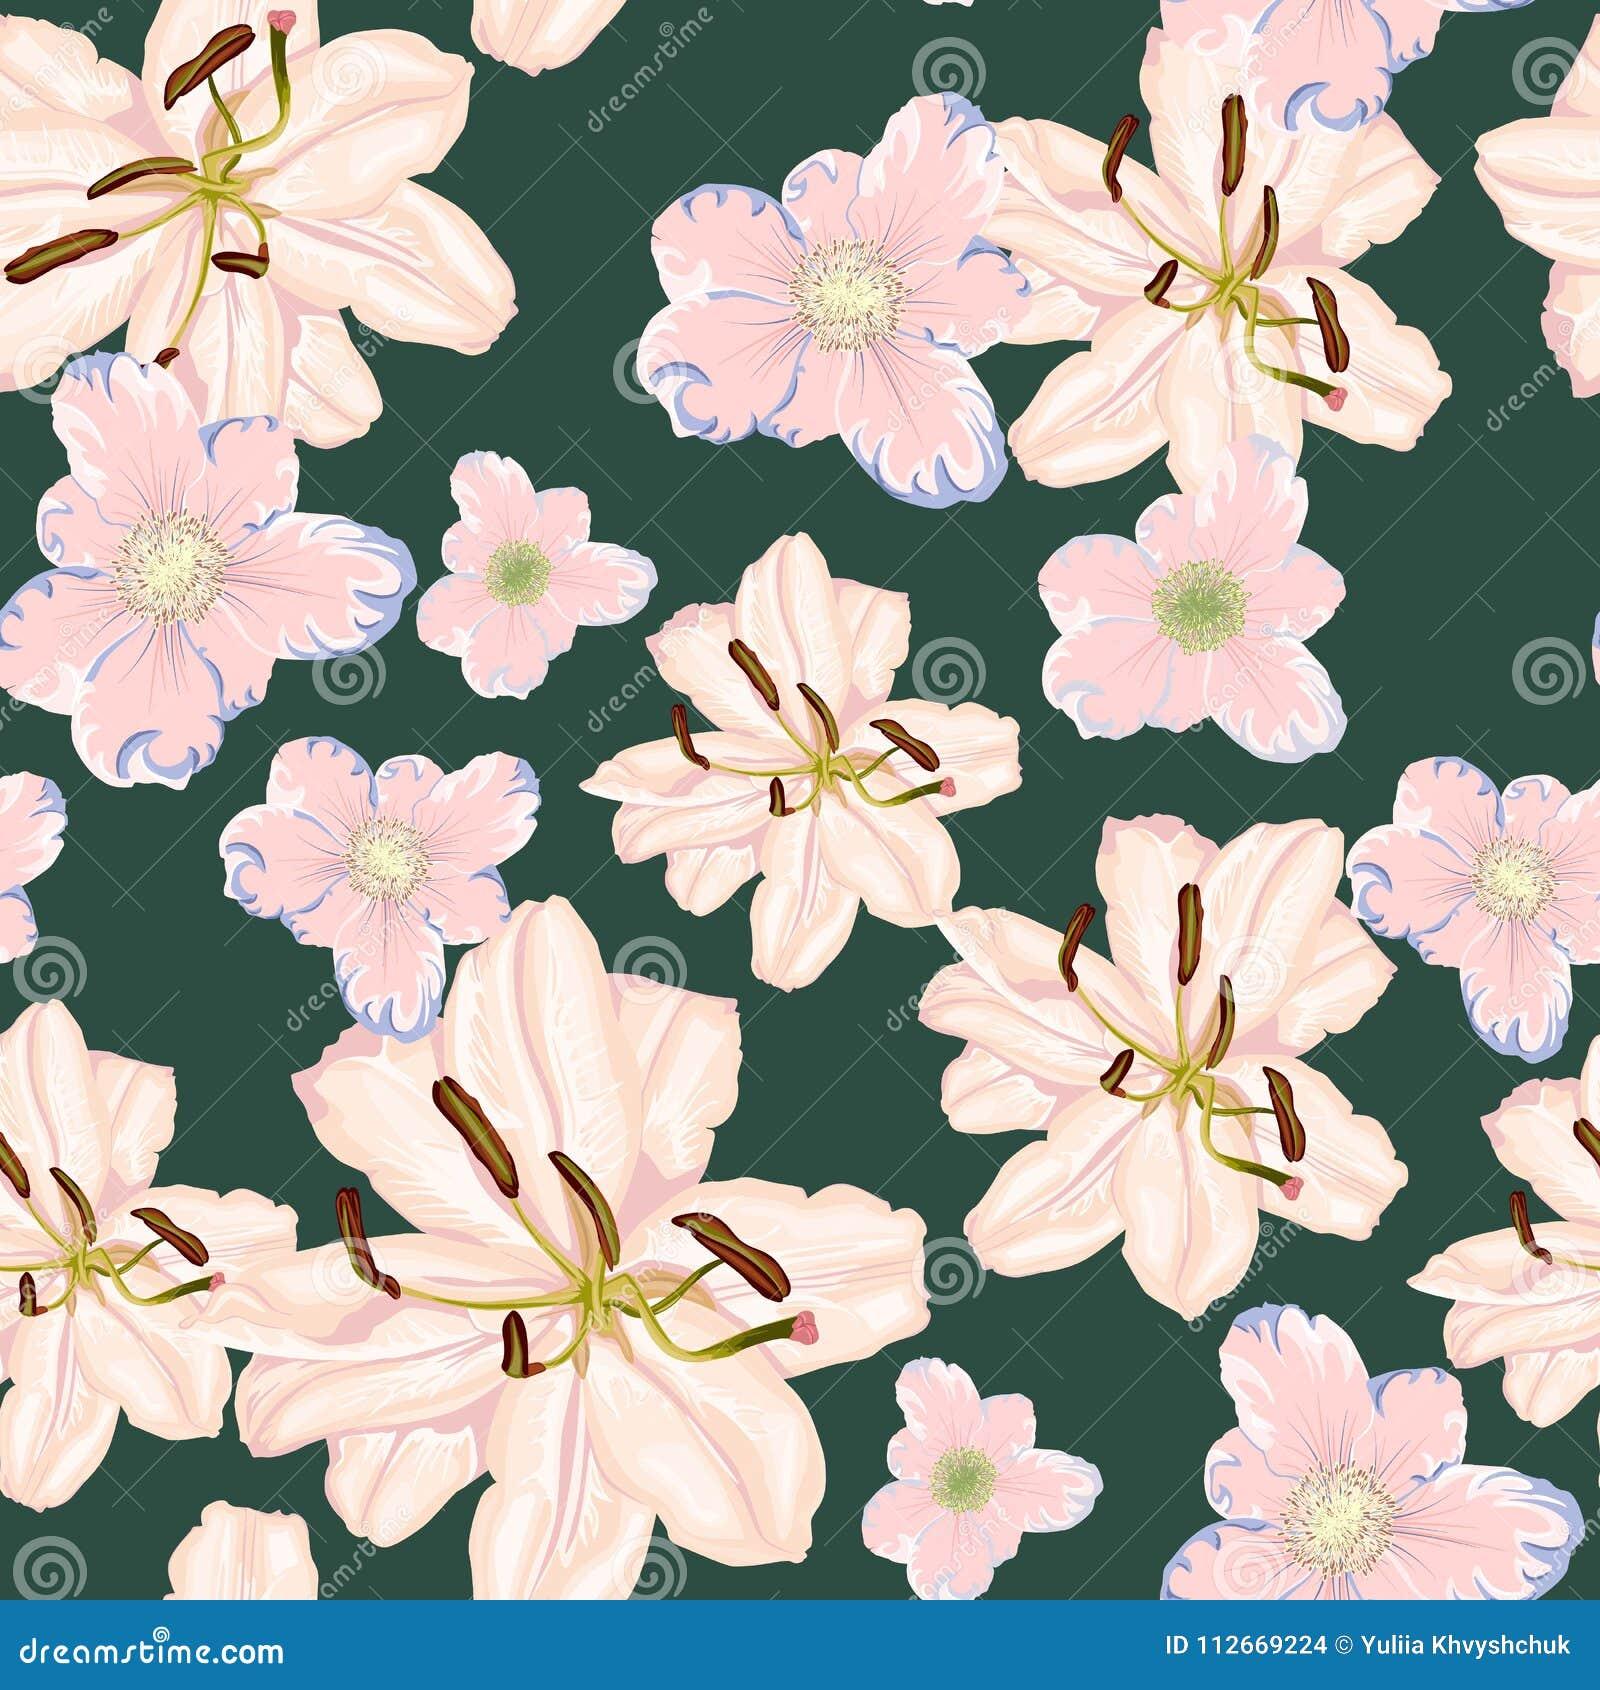 Beautiful white lilies flowers seamless pattern on black background download beautiful white lilies flowers seamless pattern on black background vector illustration stock izmirmasajfo